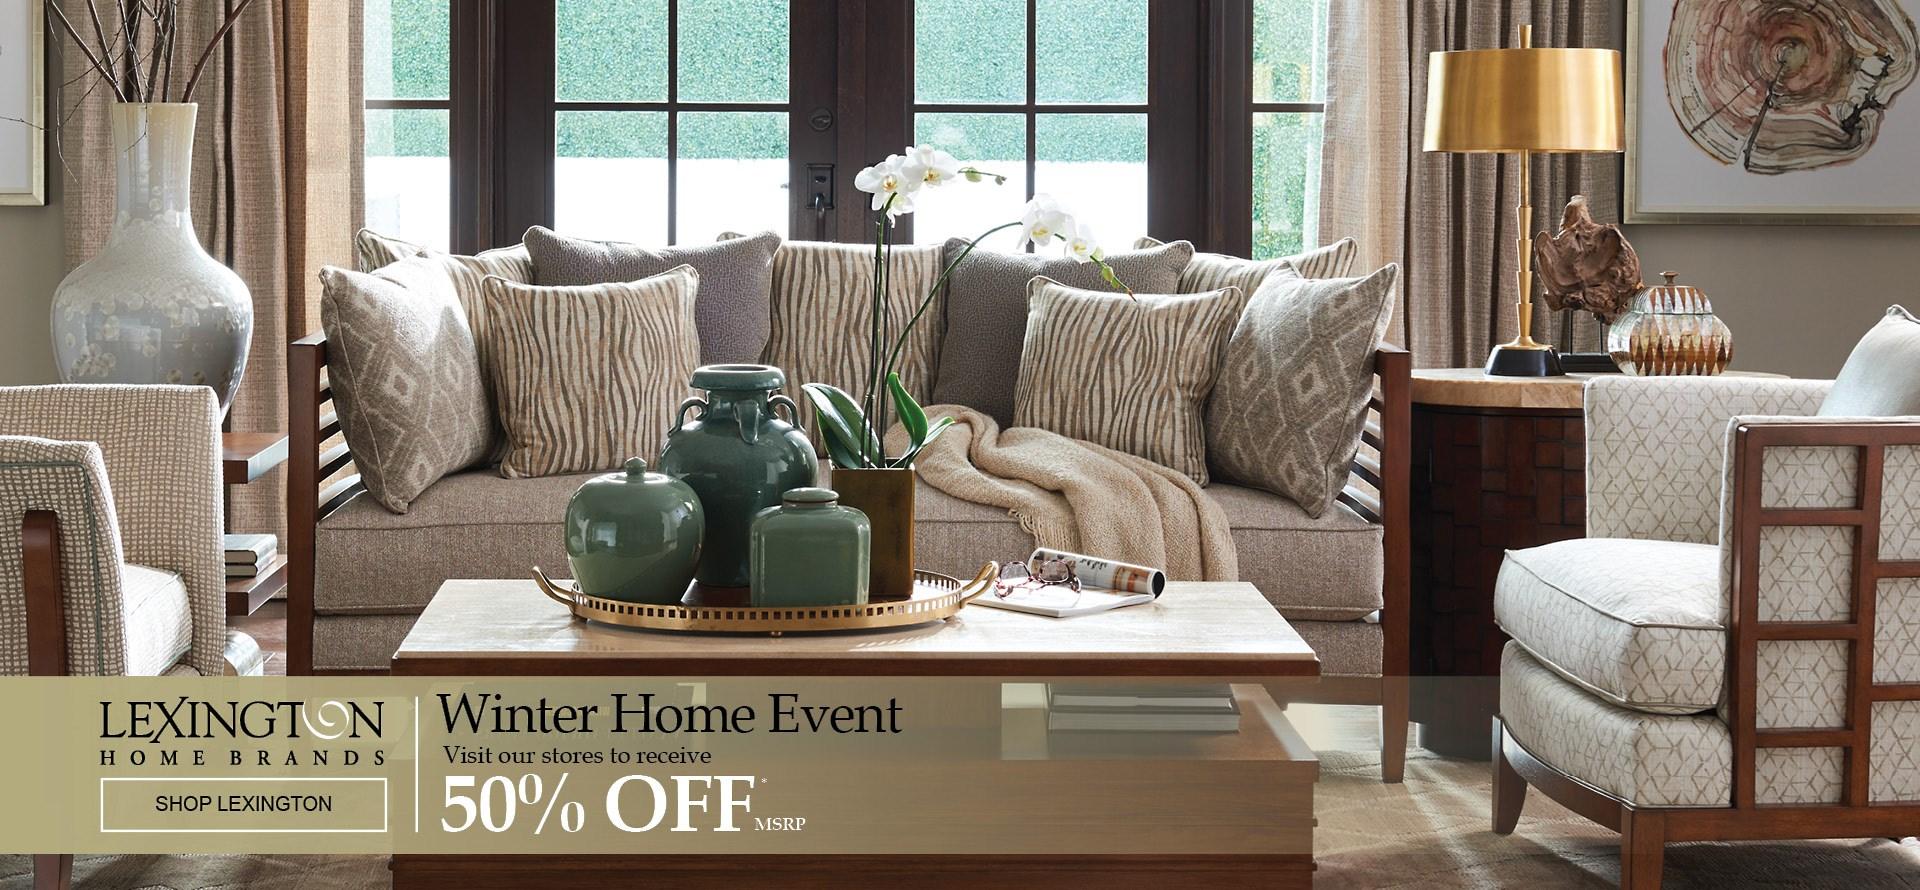 Lexington Winter Home Event